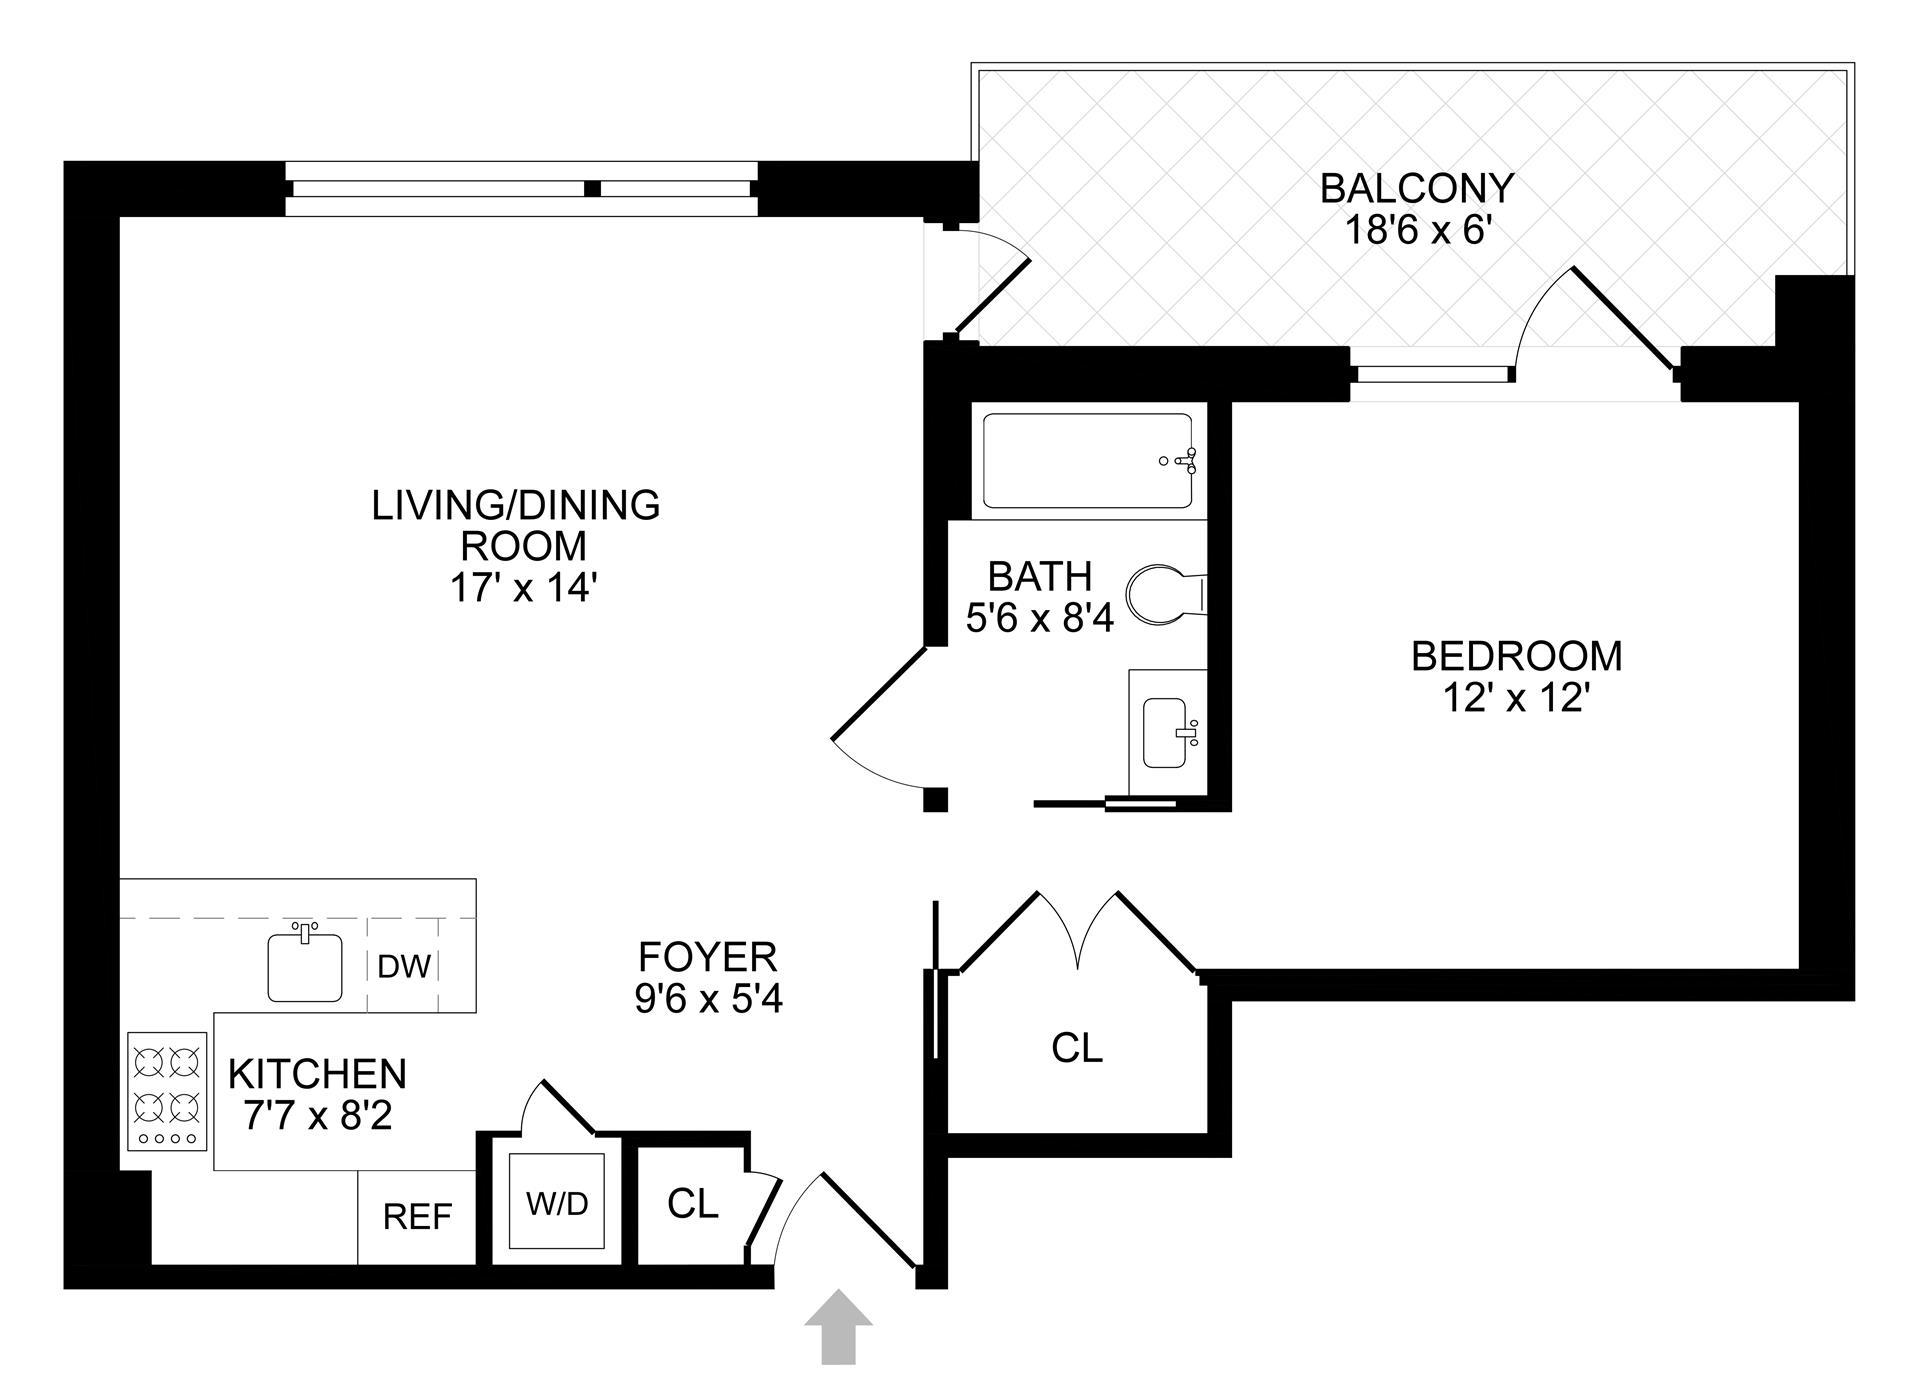 Floor plan of 299 Van Buren Street, 4B - Bedford - Stuyvesant, New York